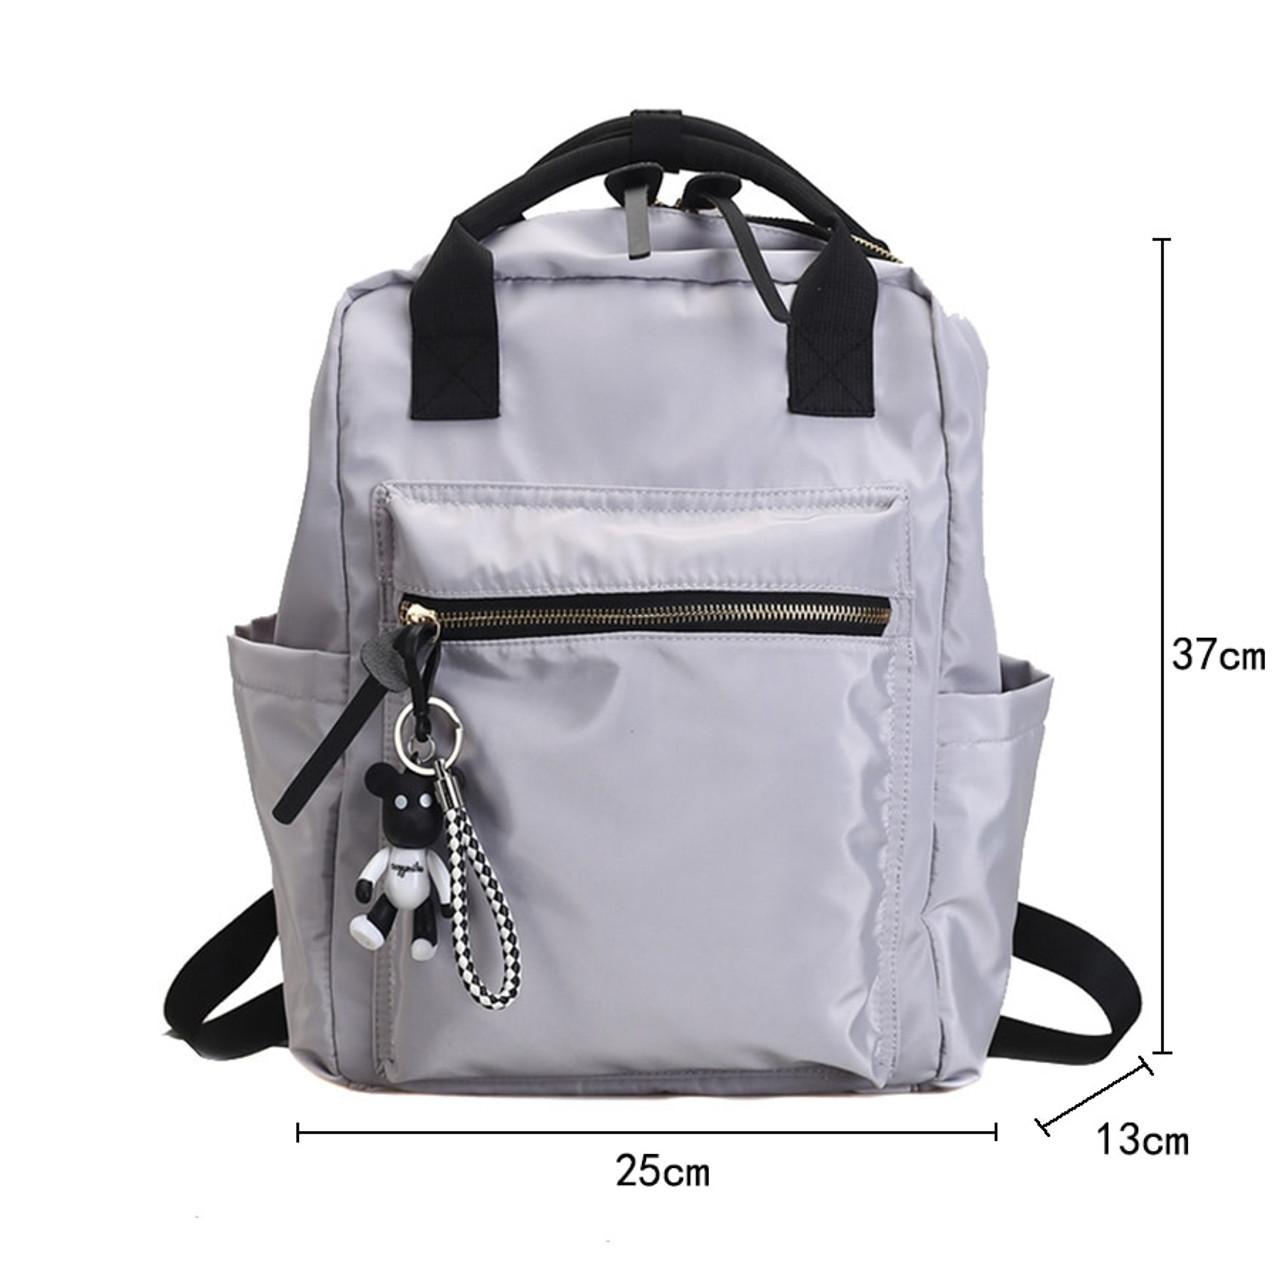 Casual Nylon Backpack Women Large Capacity School Bag Teenager Mochila Bolsa Solid Color Girls Travel Bags Students 2018 Summer